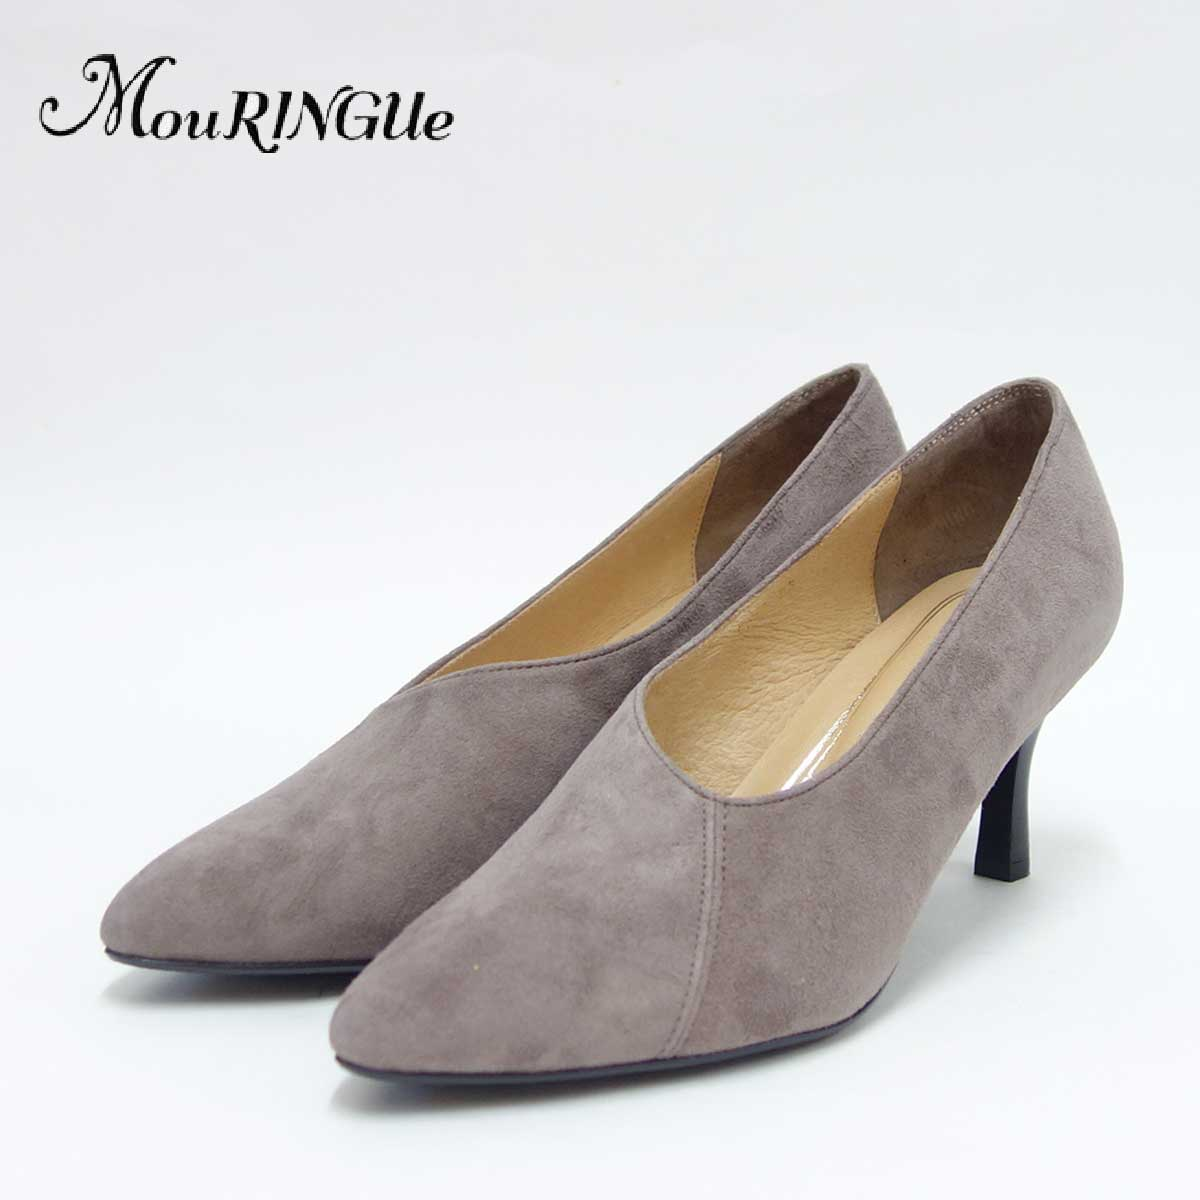 MouRINGUe ムラング Coeur519002 オークスエード (6.5cmヒール)ポインテッドトゥパンプス(日本製)「靴」